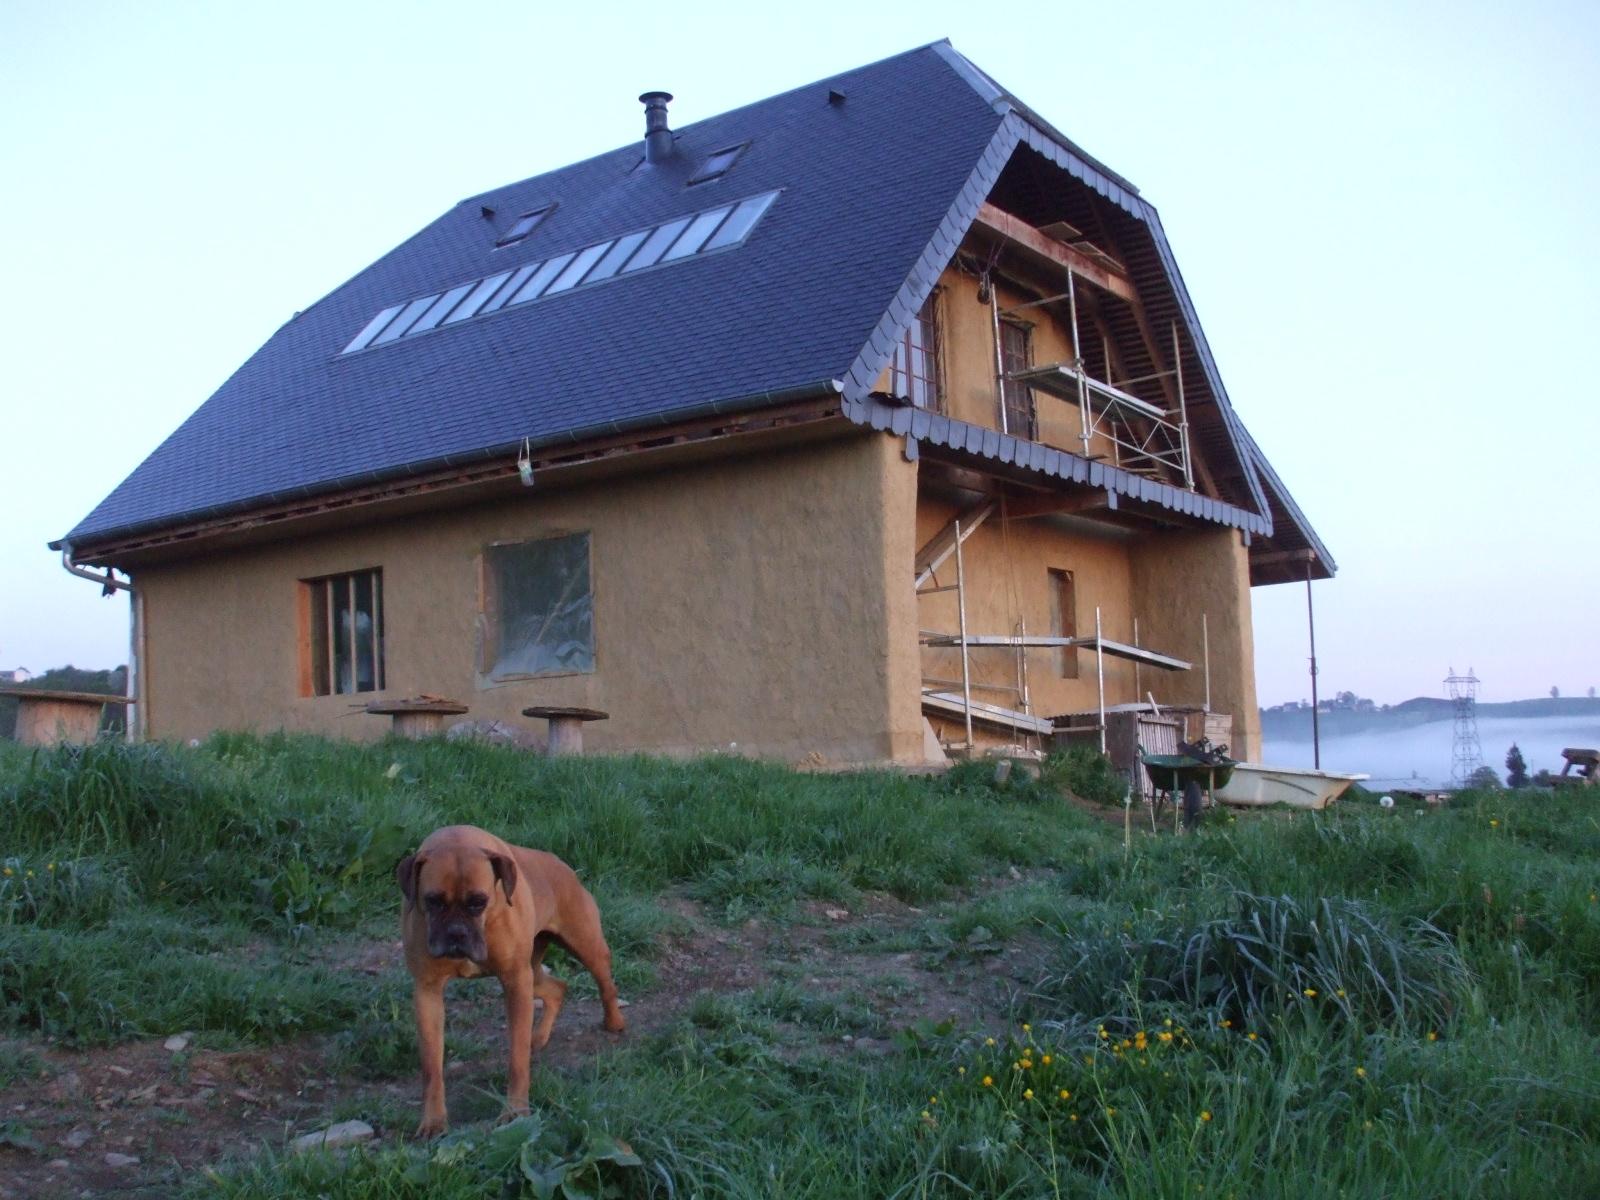 In search of the kiwi la maison en paille the straw house for Maisons en paille